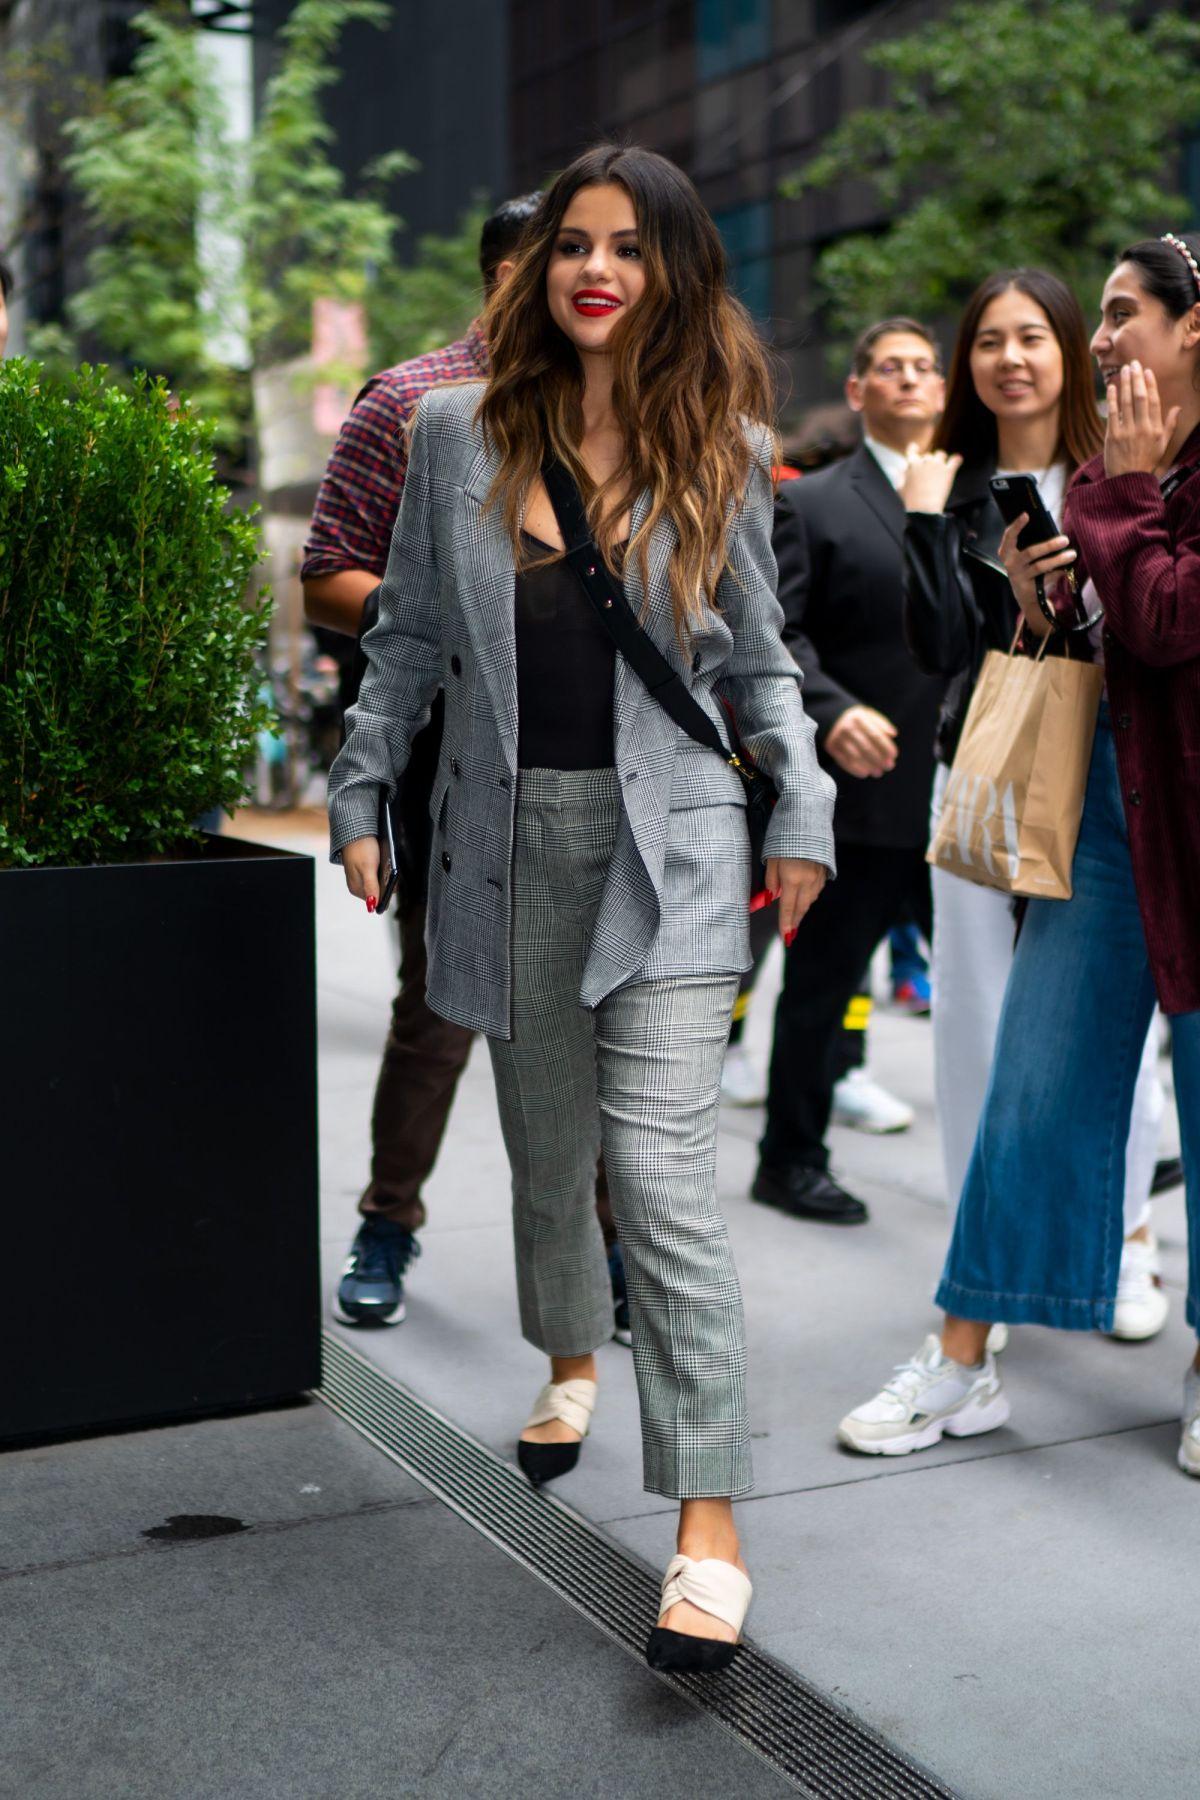 Selena Gomez Got a 2020 Version of 'The Rachel' Haircut